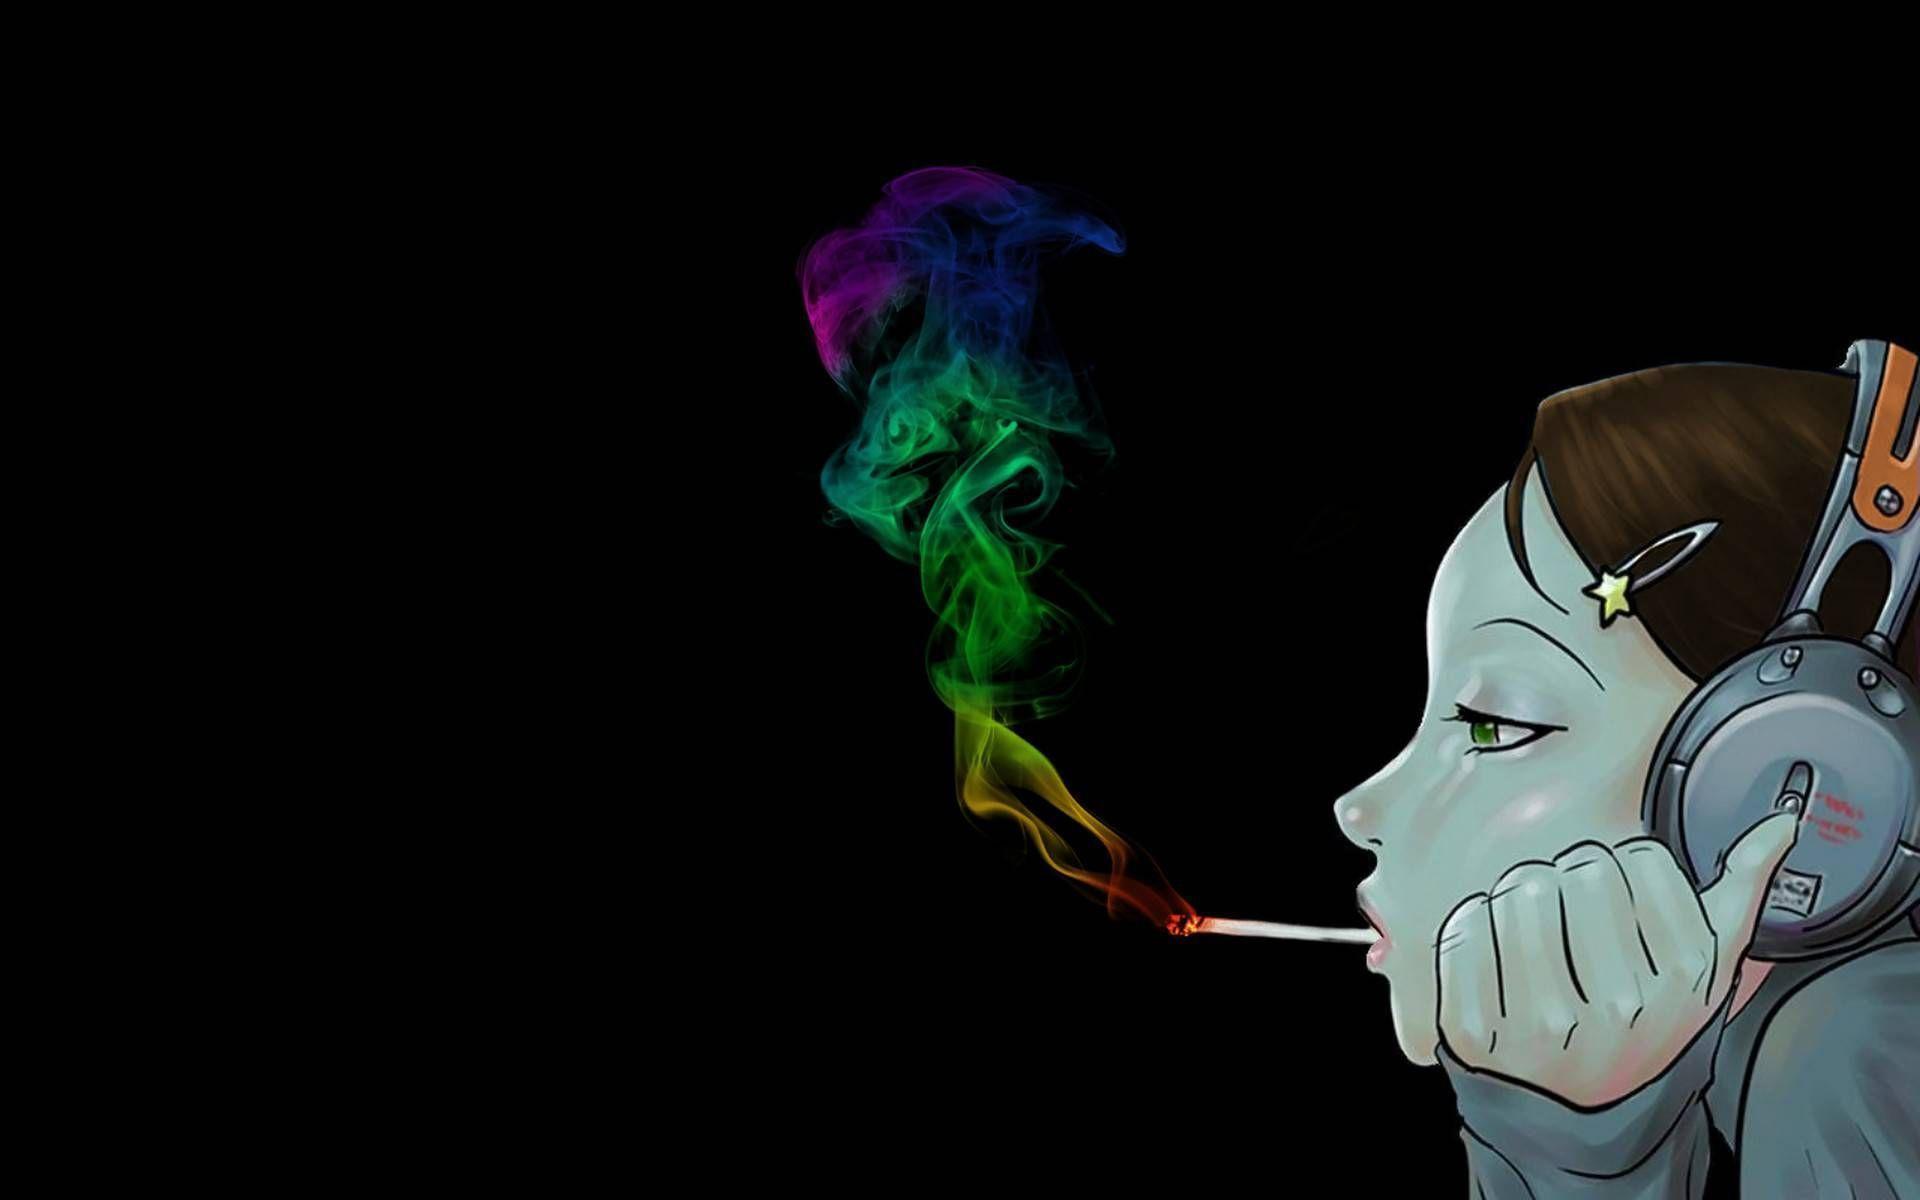 Smokin Dope Cartoons Wallpapers Top Free Smokin Dope Cartoons